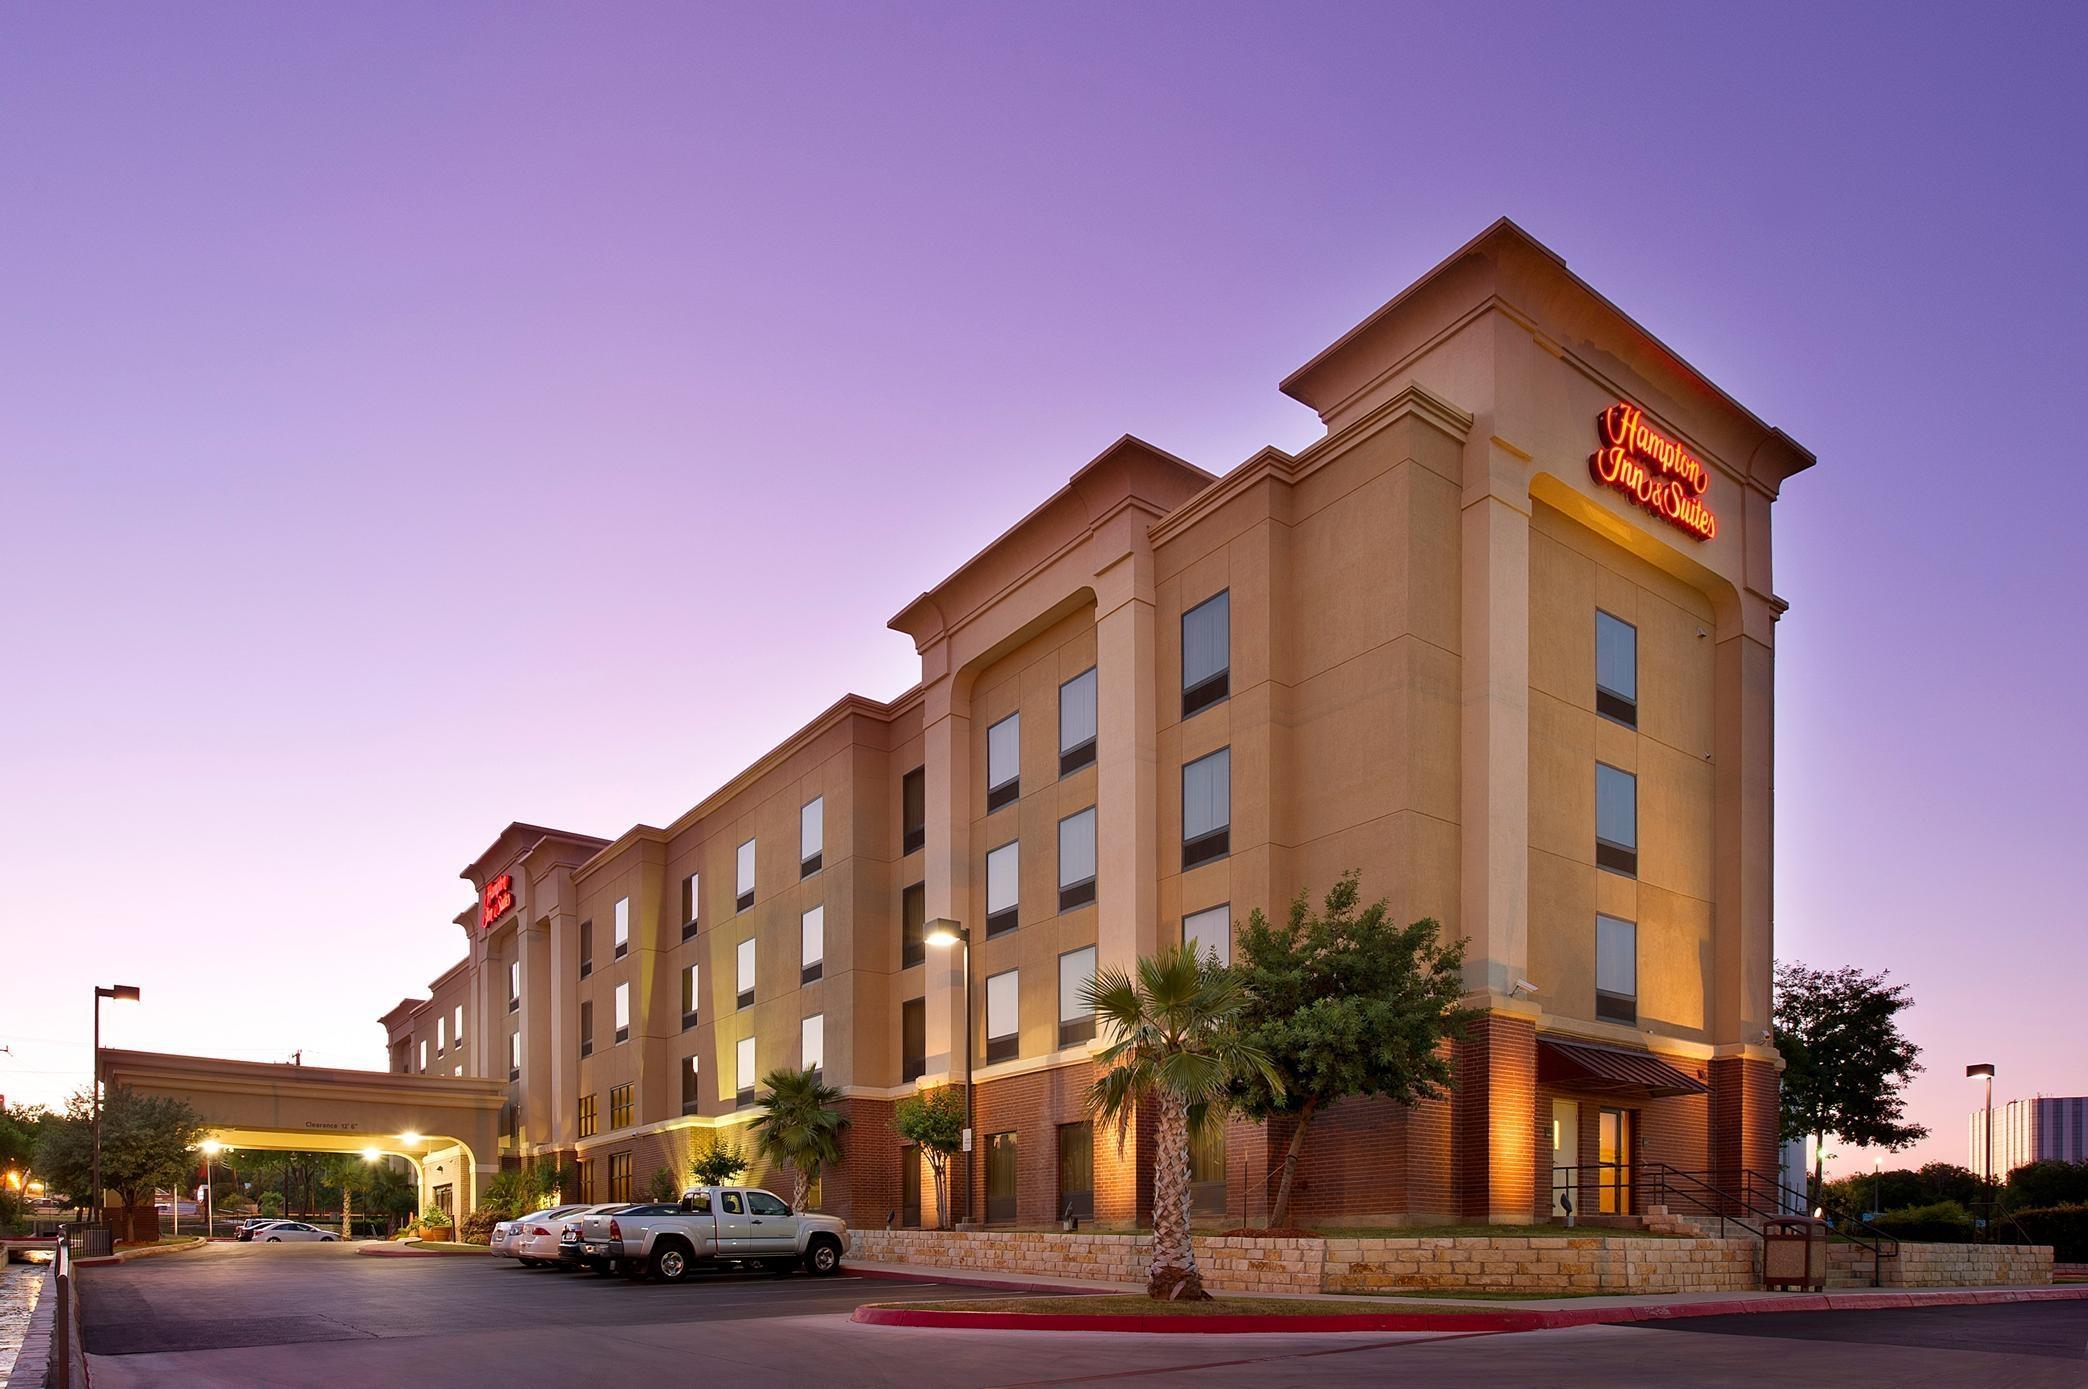 Hampton Inn & Suites San Antonio-Airport image 1